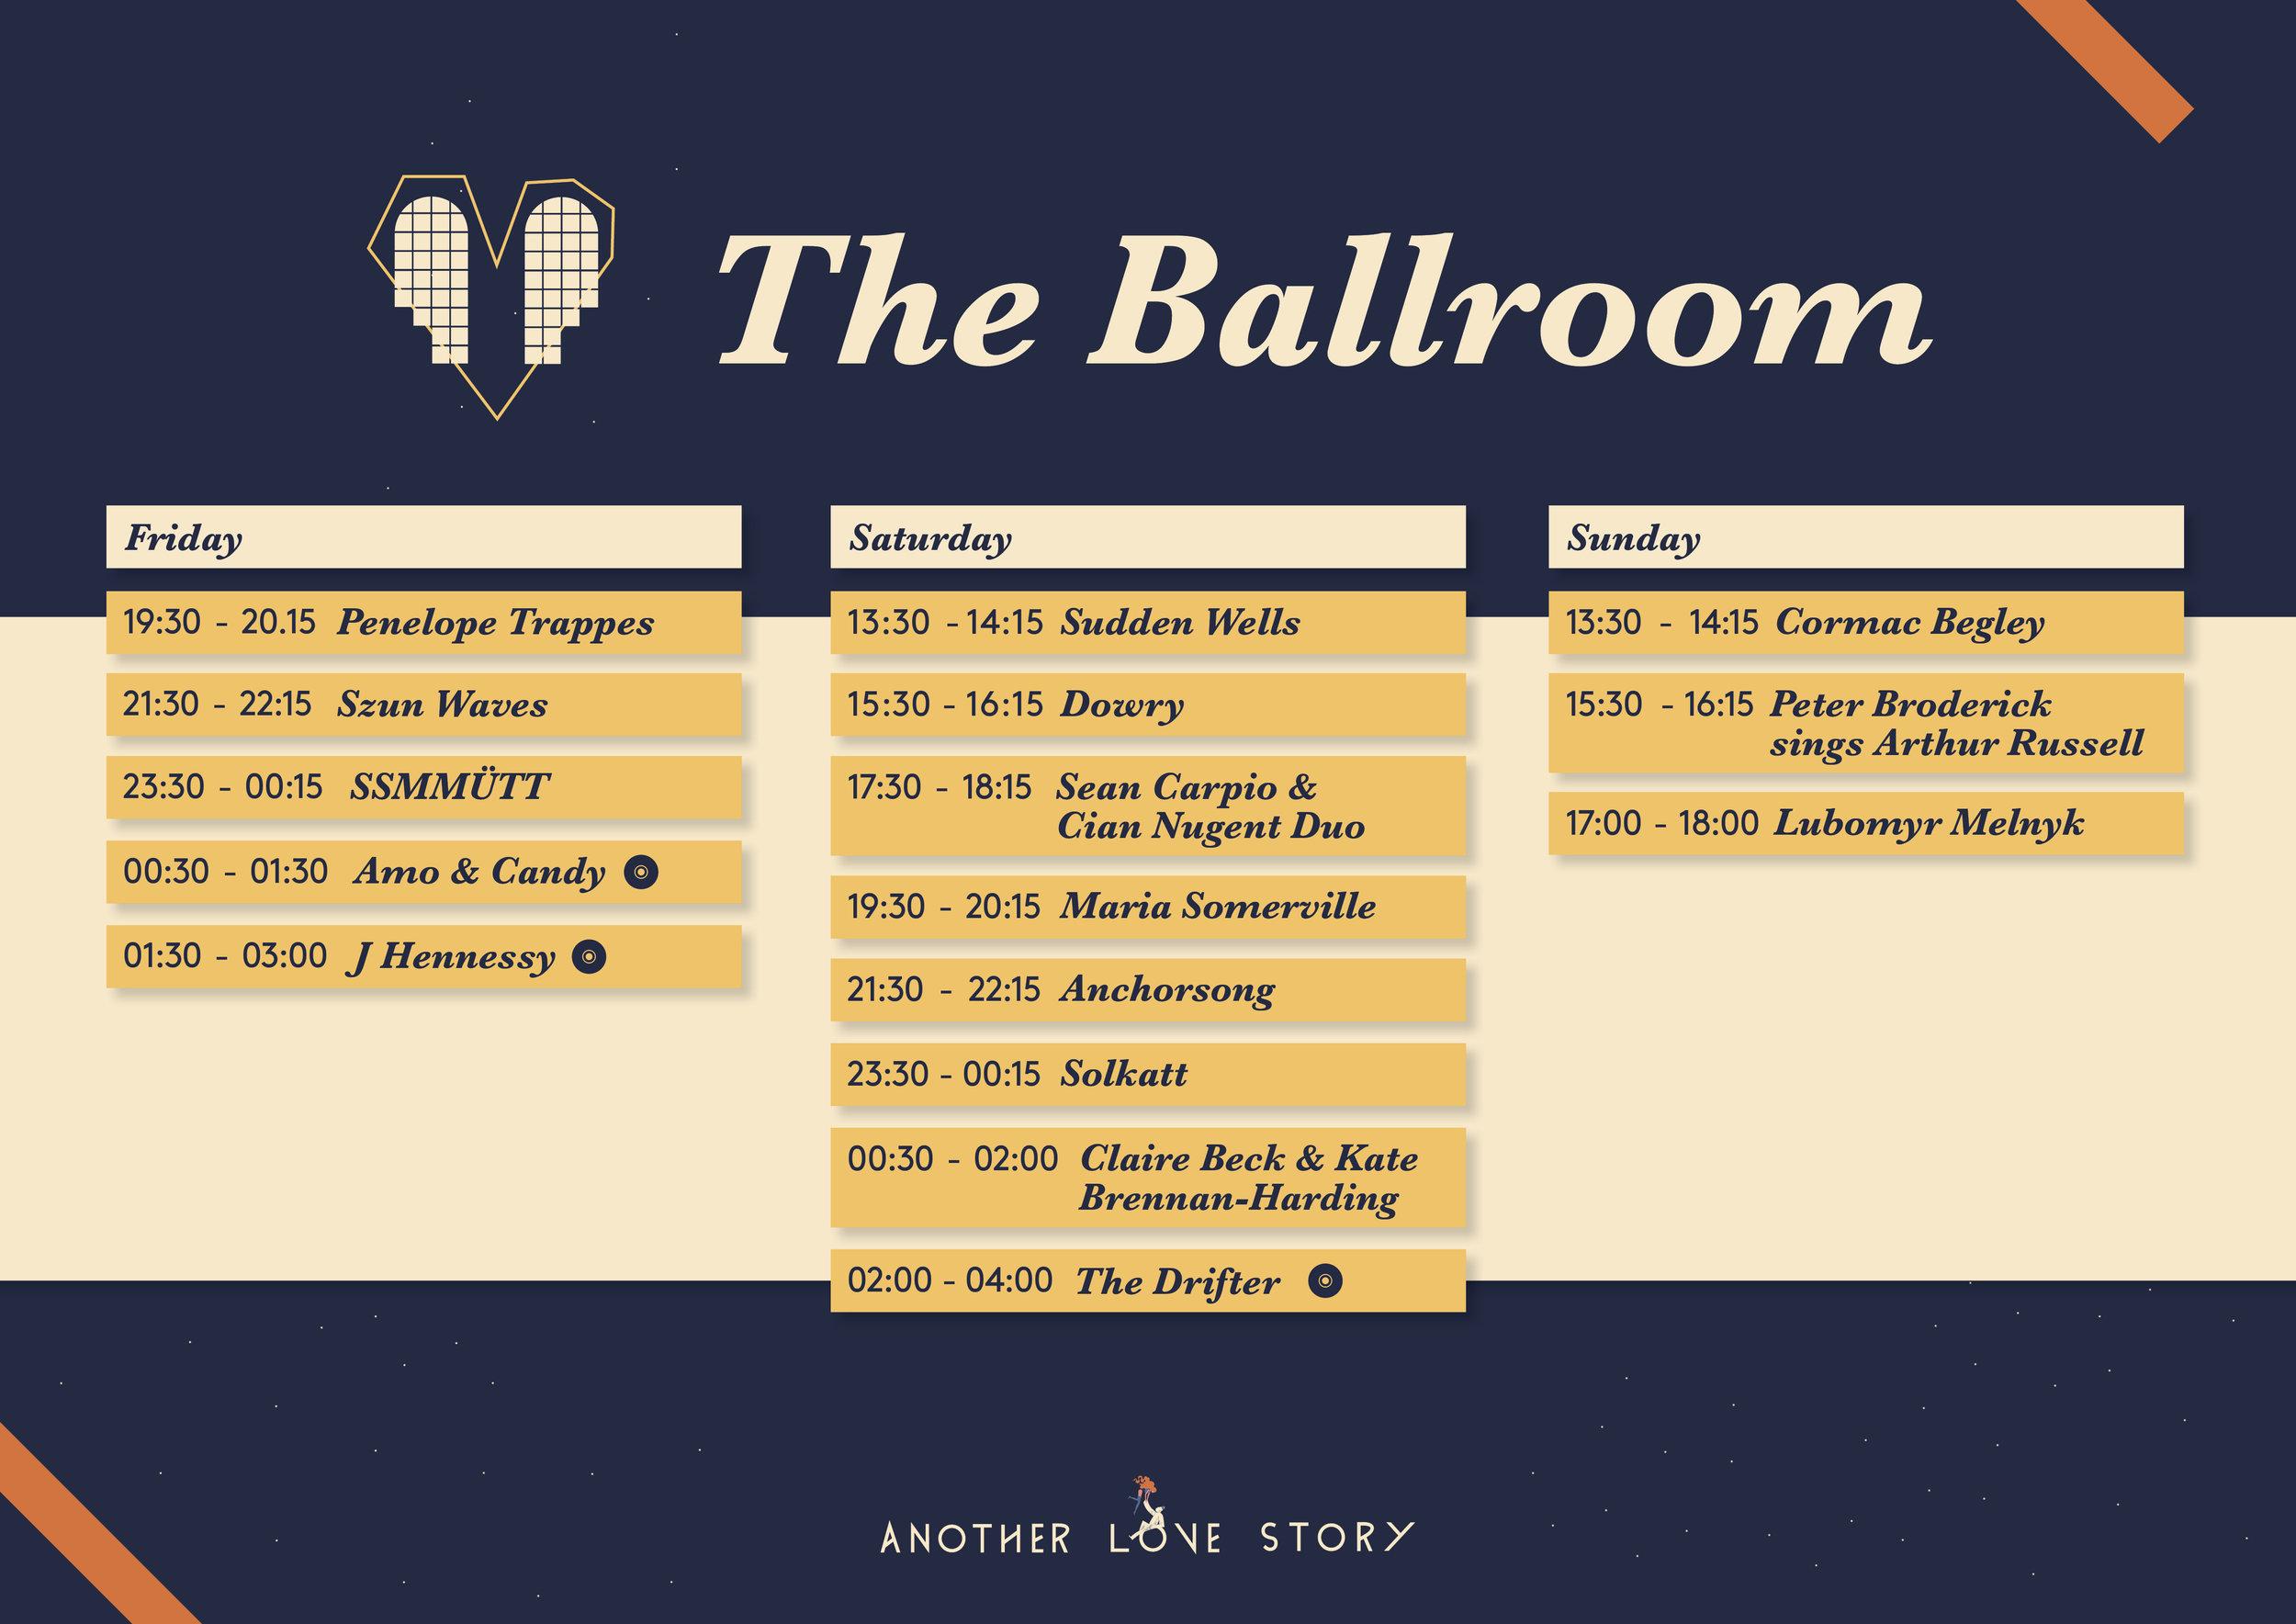 schedules_ballroom.jpg